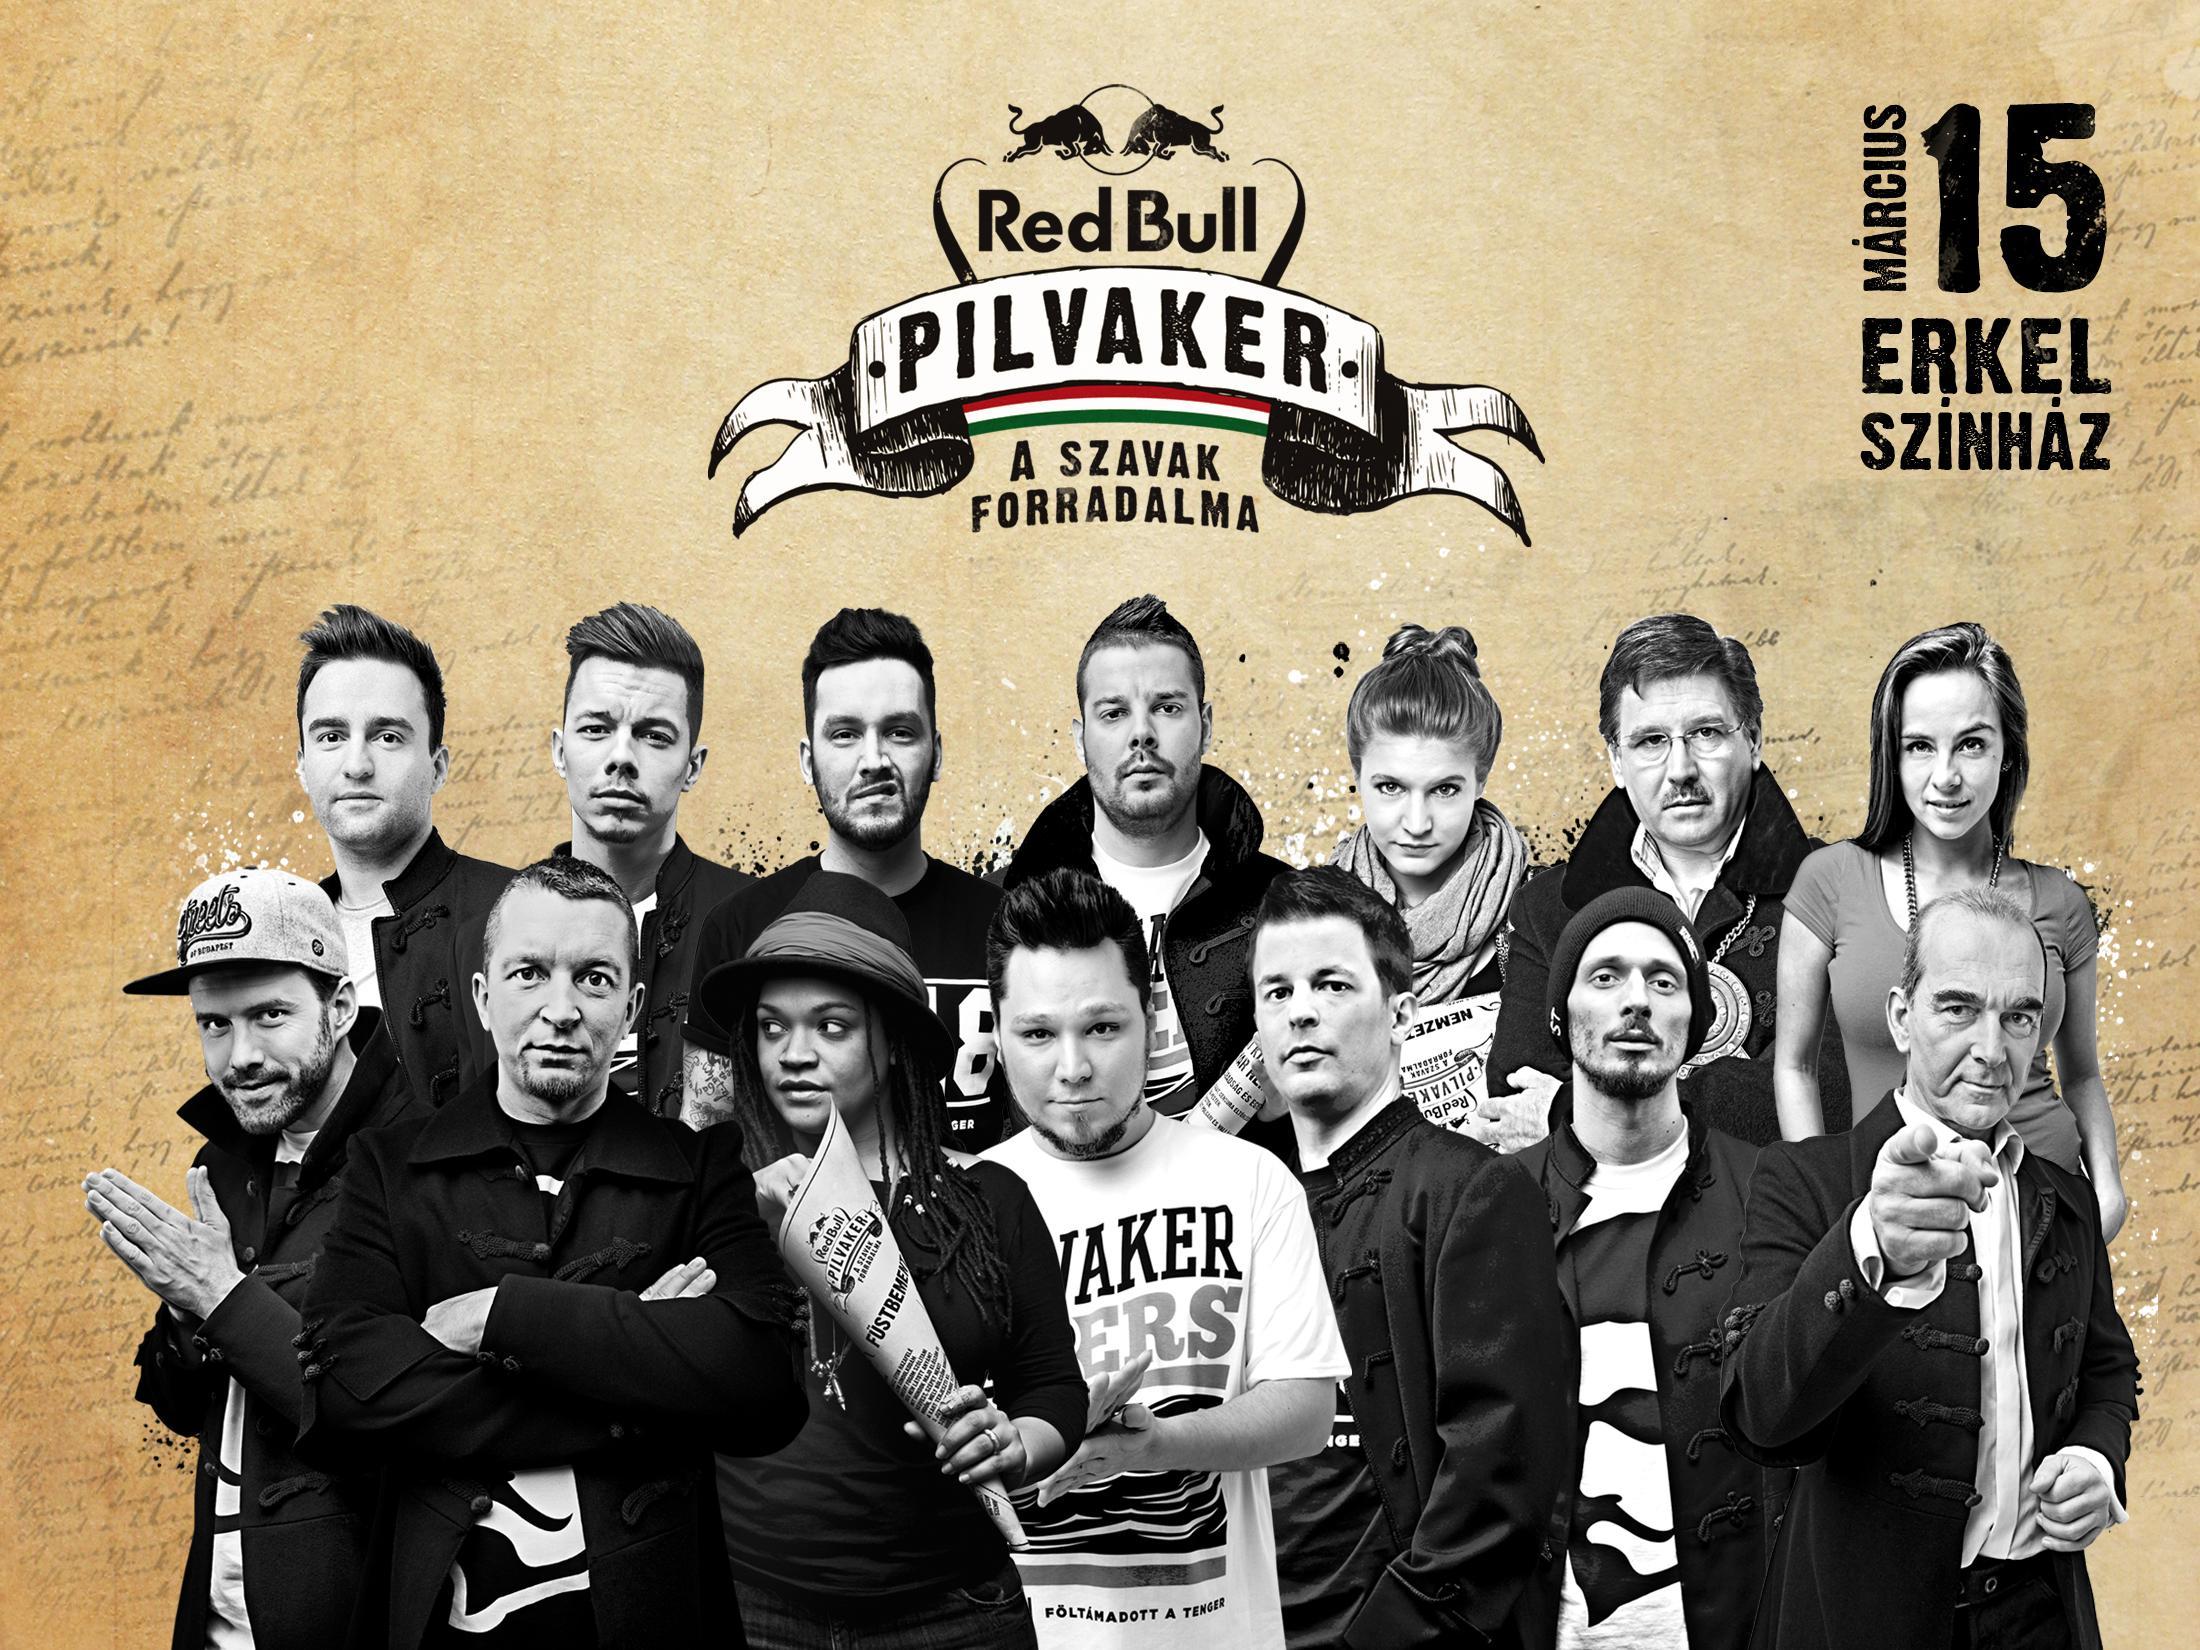 pilvaker_team_1.jpg